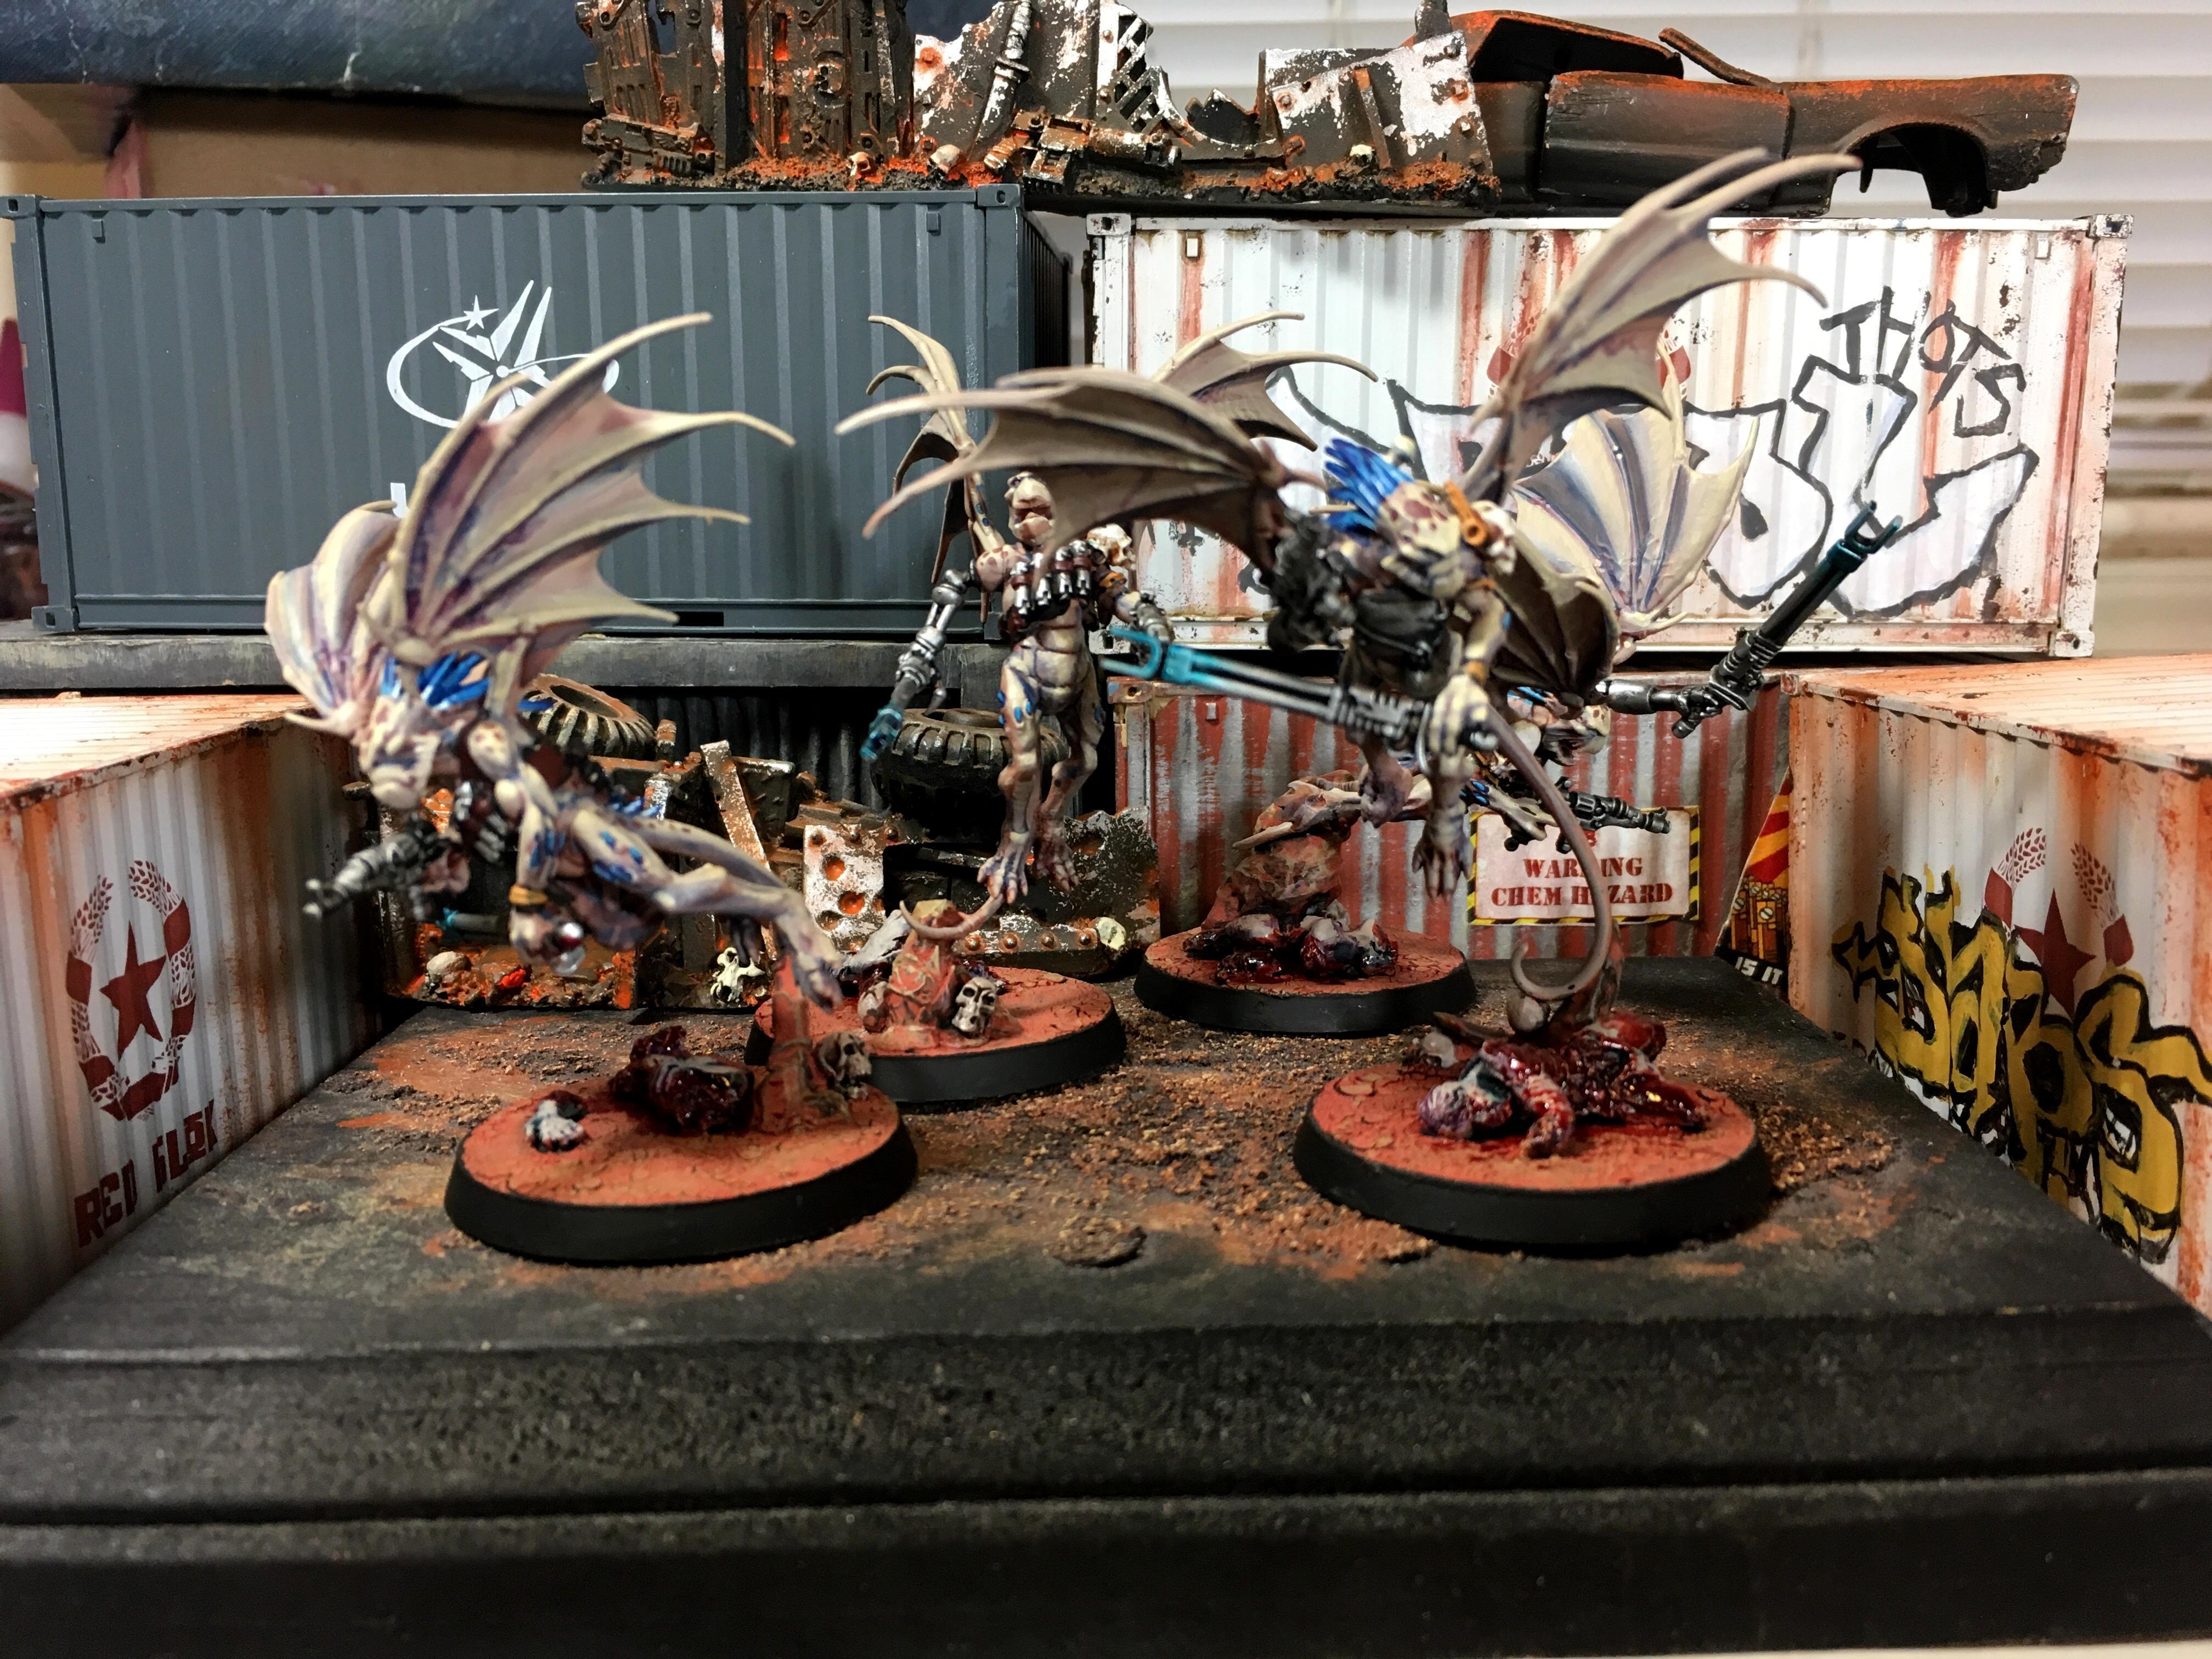 Kroot, Mercenary, Van Saar, Vulture